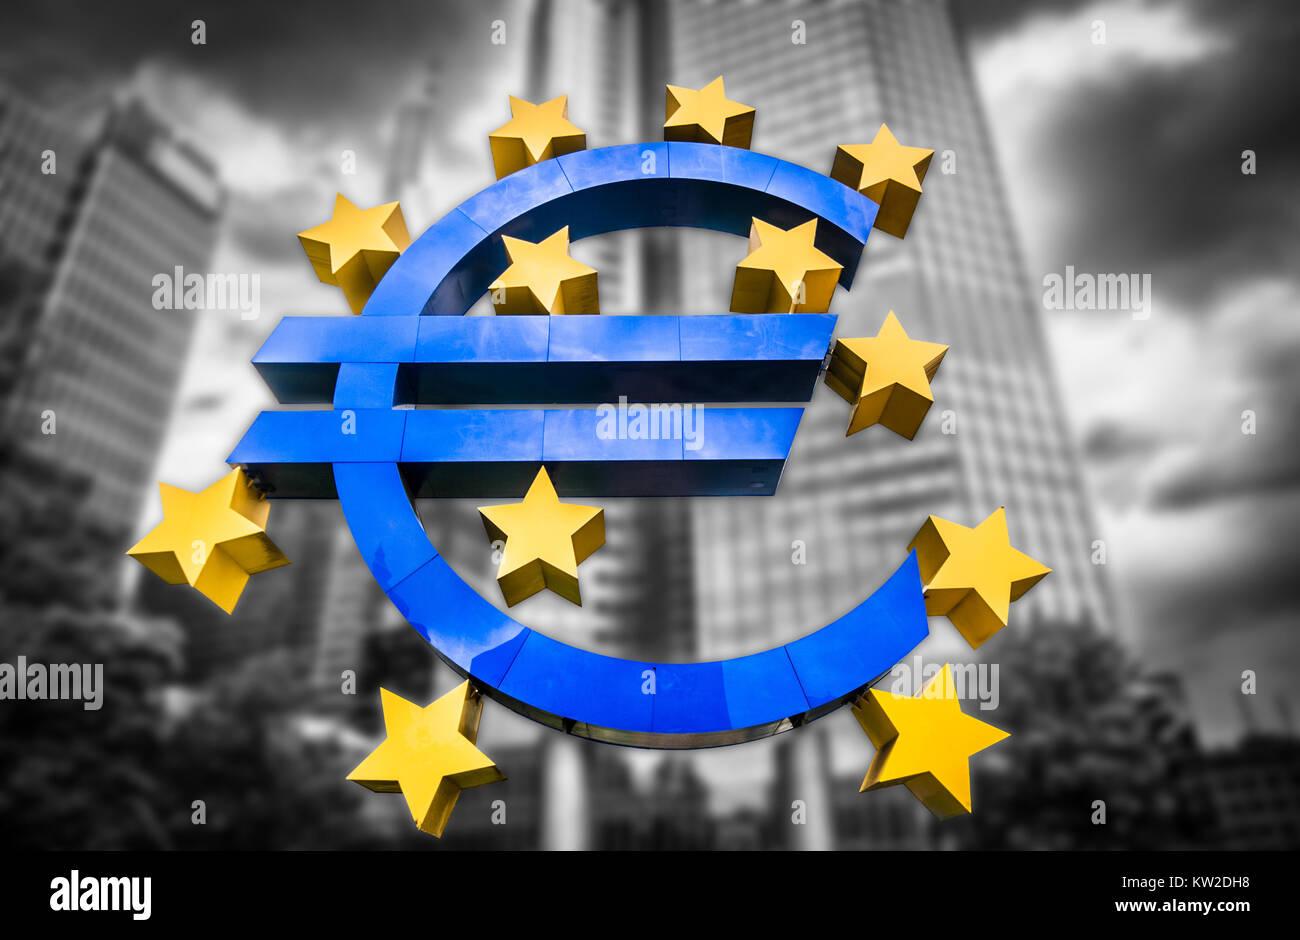 Simbolo dell'euro alla Banca centrale europea sede a ...